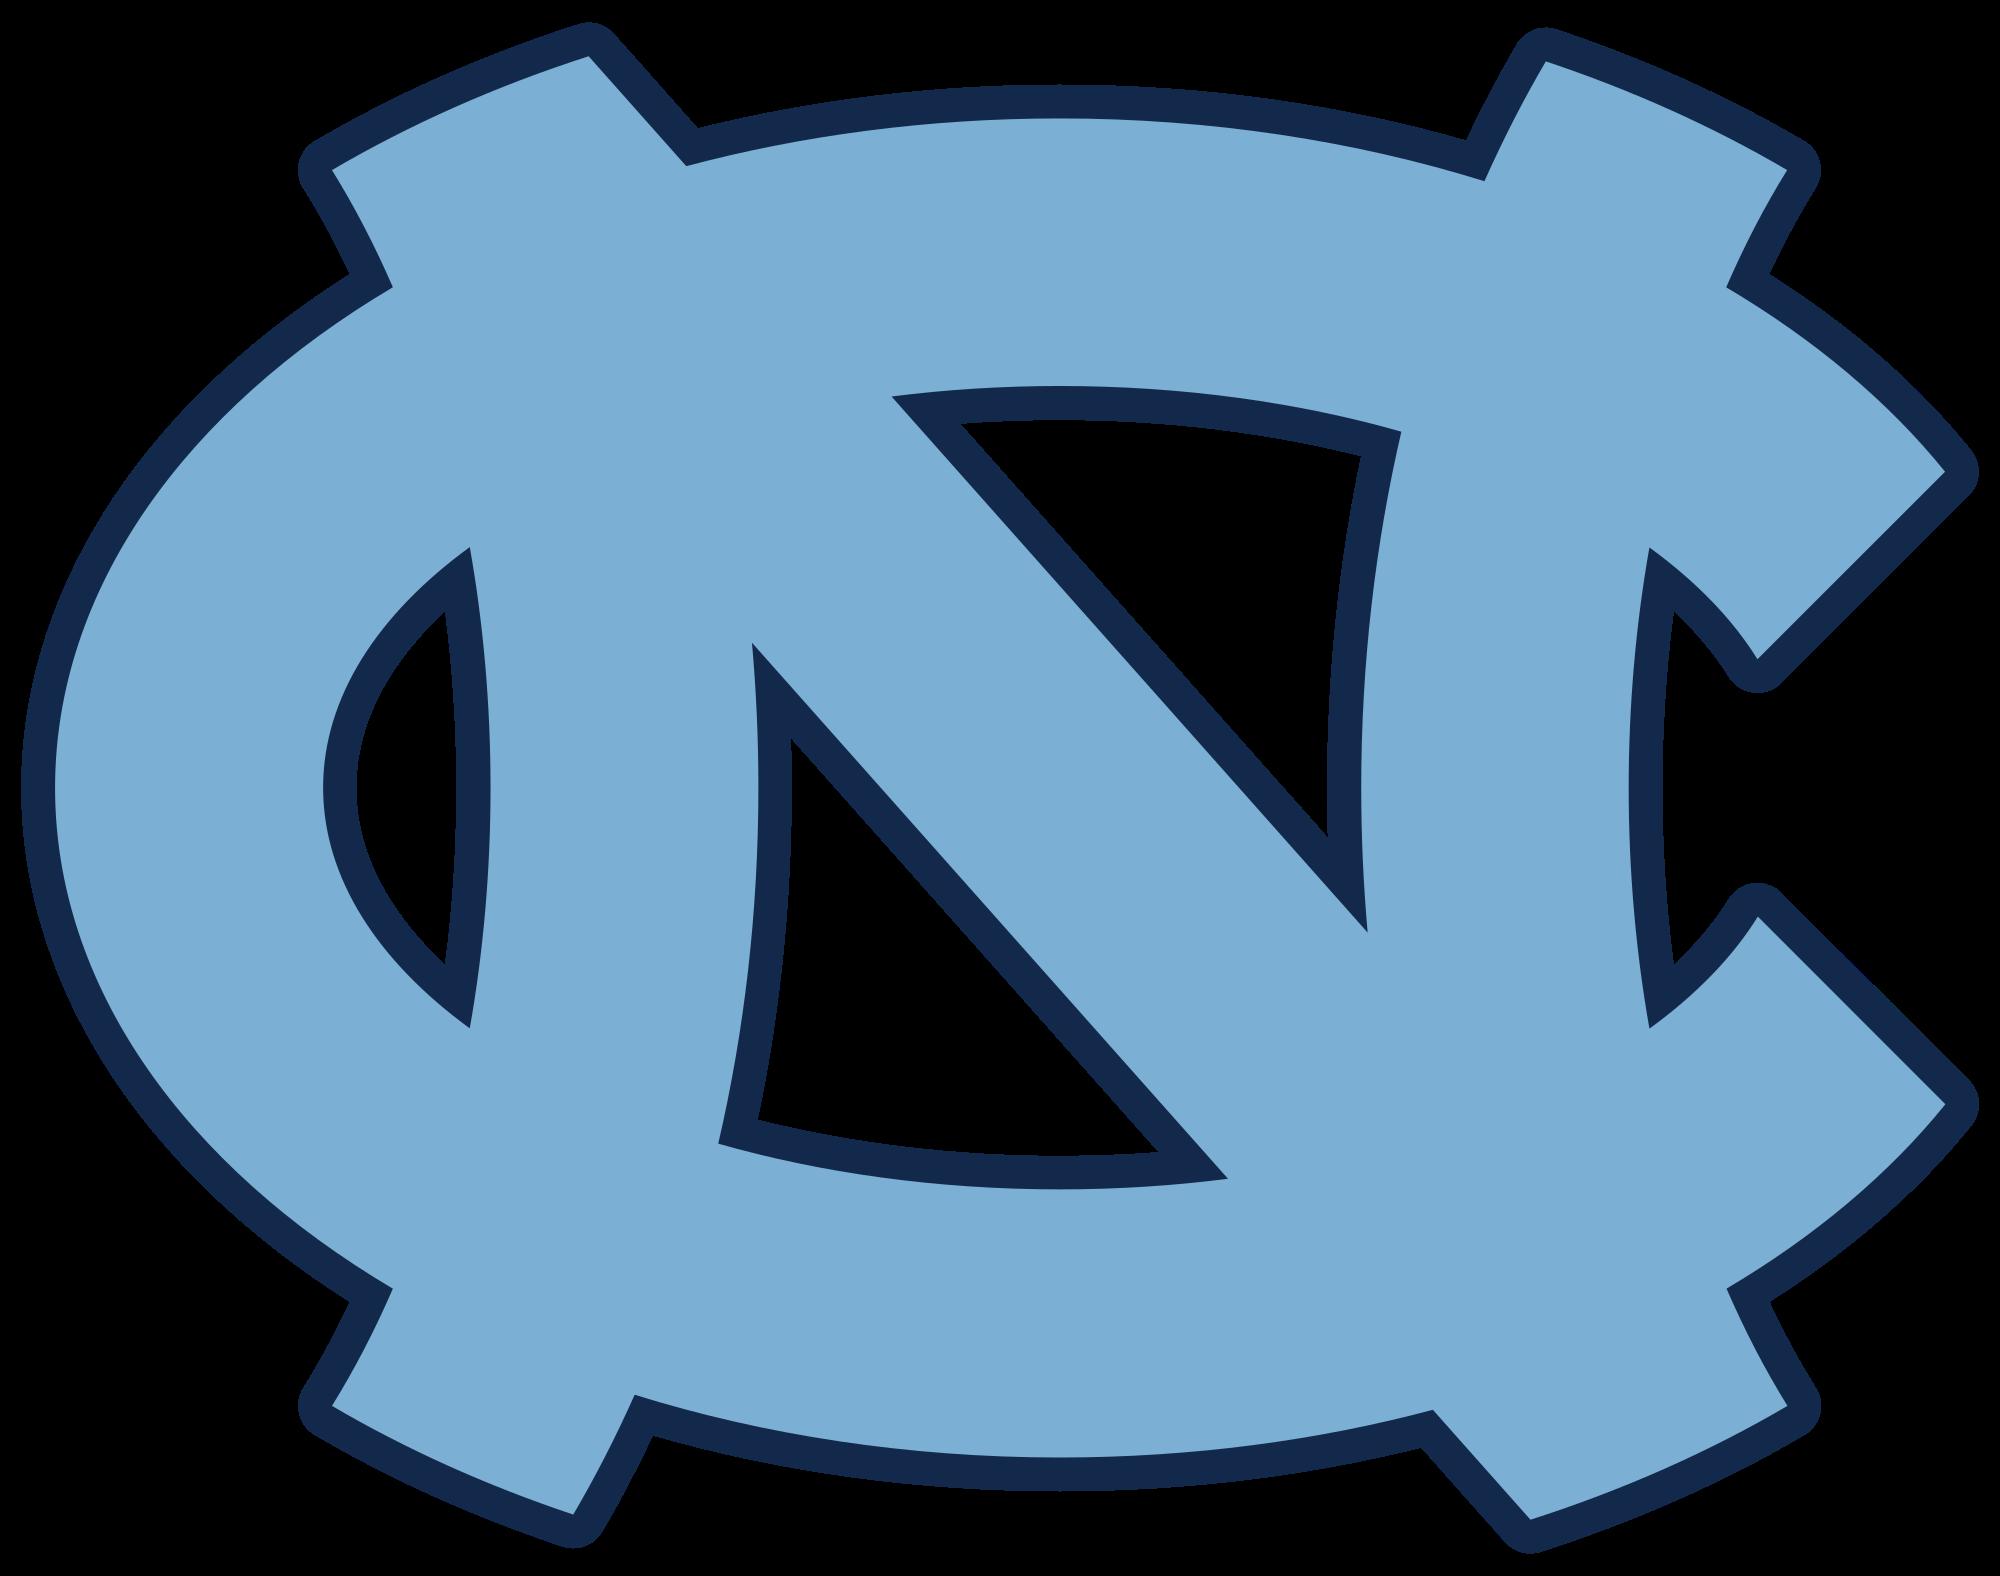 High resolution tarheel basketball clipart vector freeuse download File:North Carolina Tar Heels logo.svg - Wikimedia Commons vector freeuse download